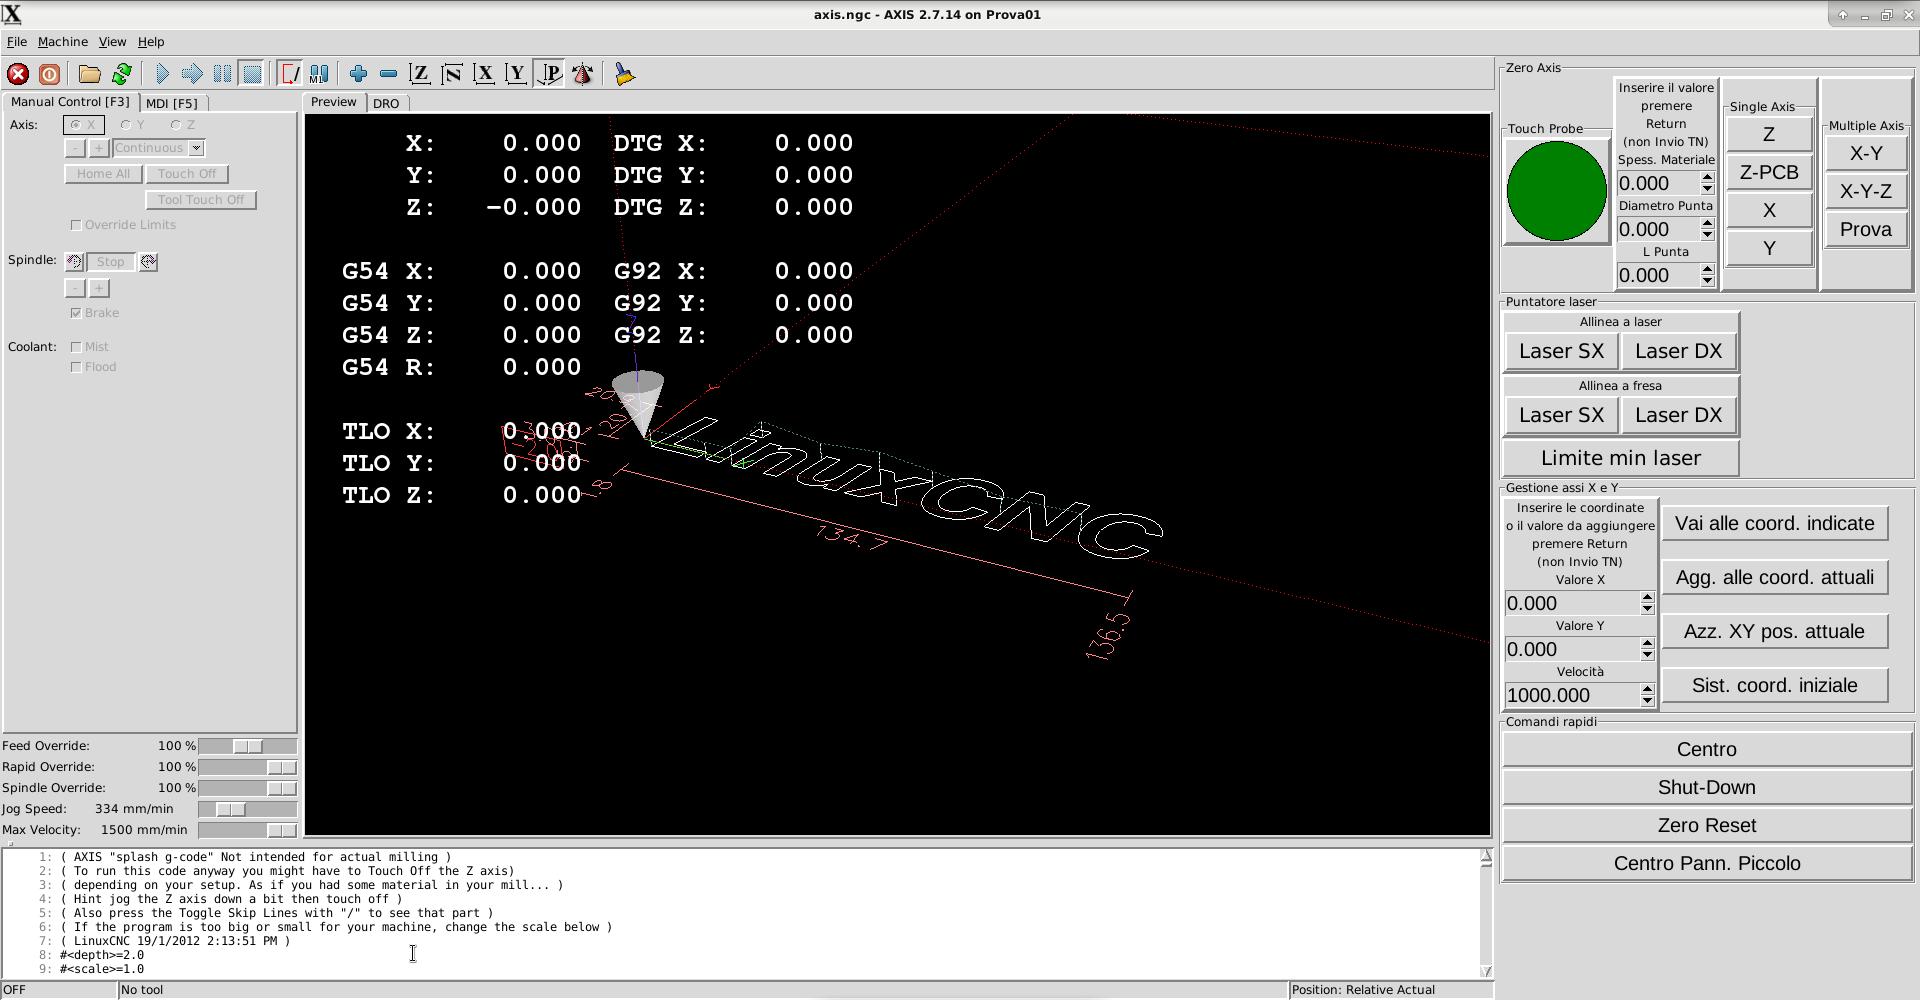 Screenshot_2020-11-19_18-40-08.png